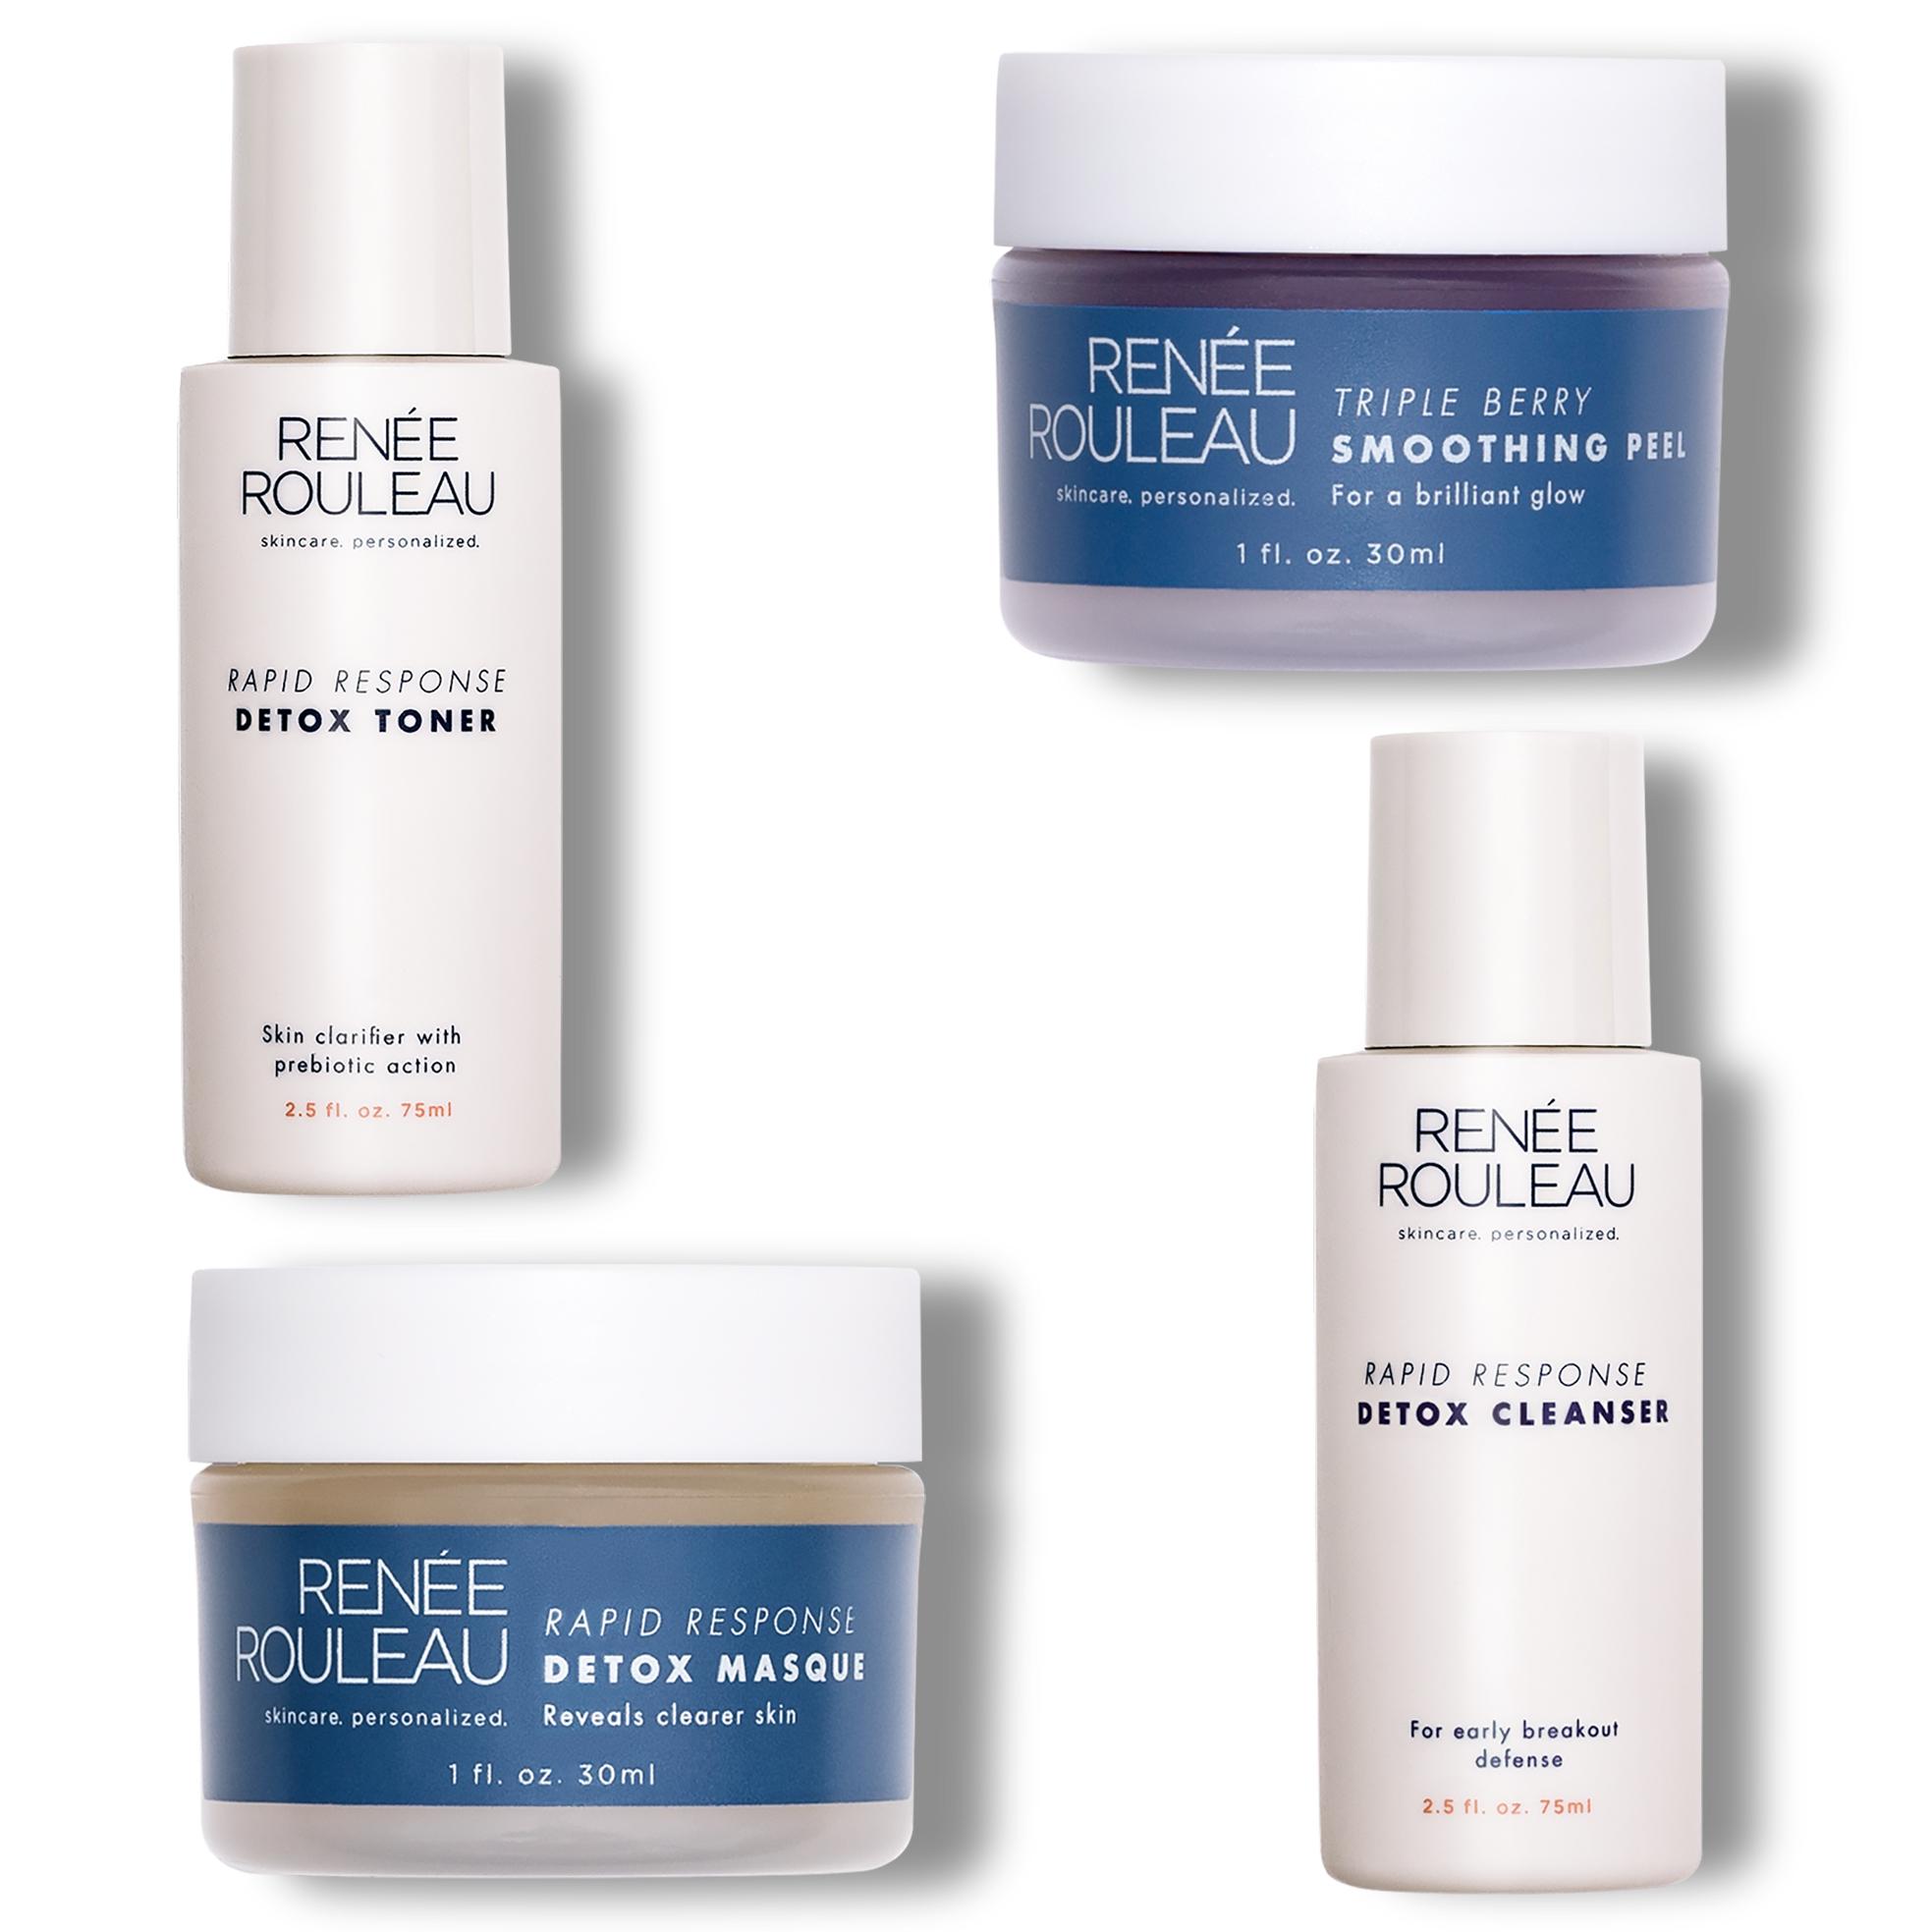 Renee Rouleau Skincare product line